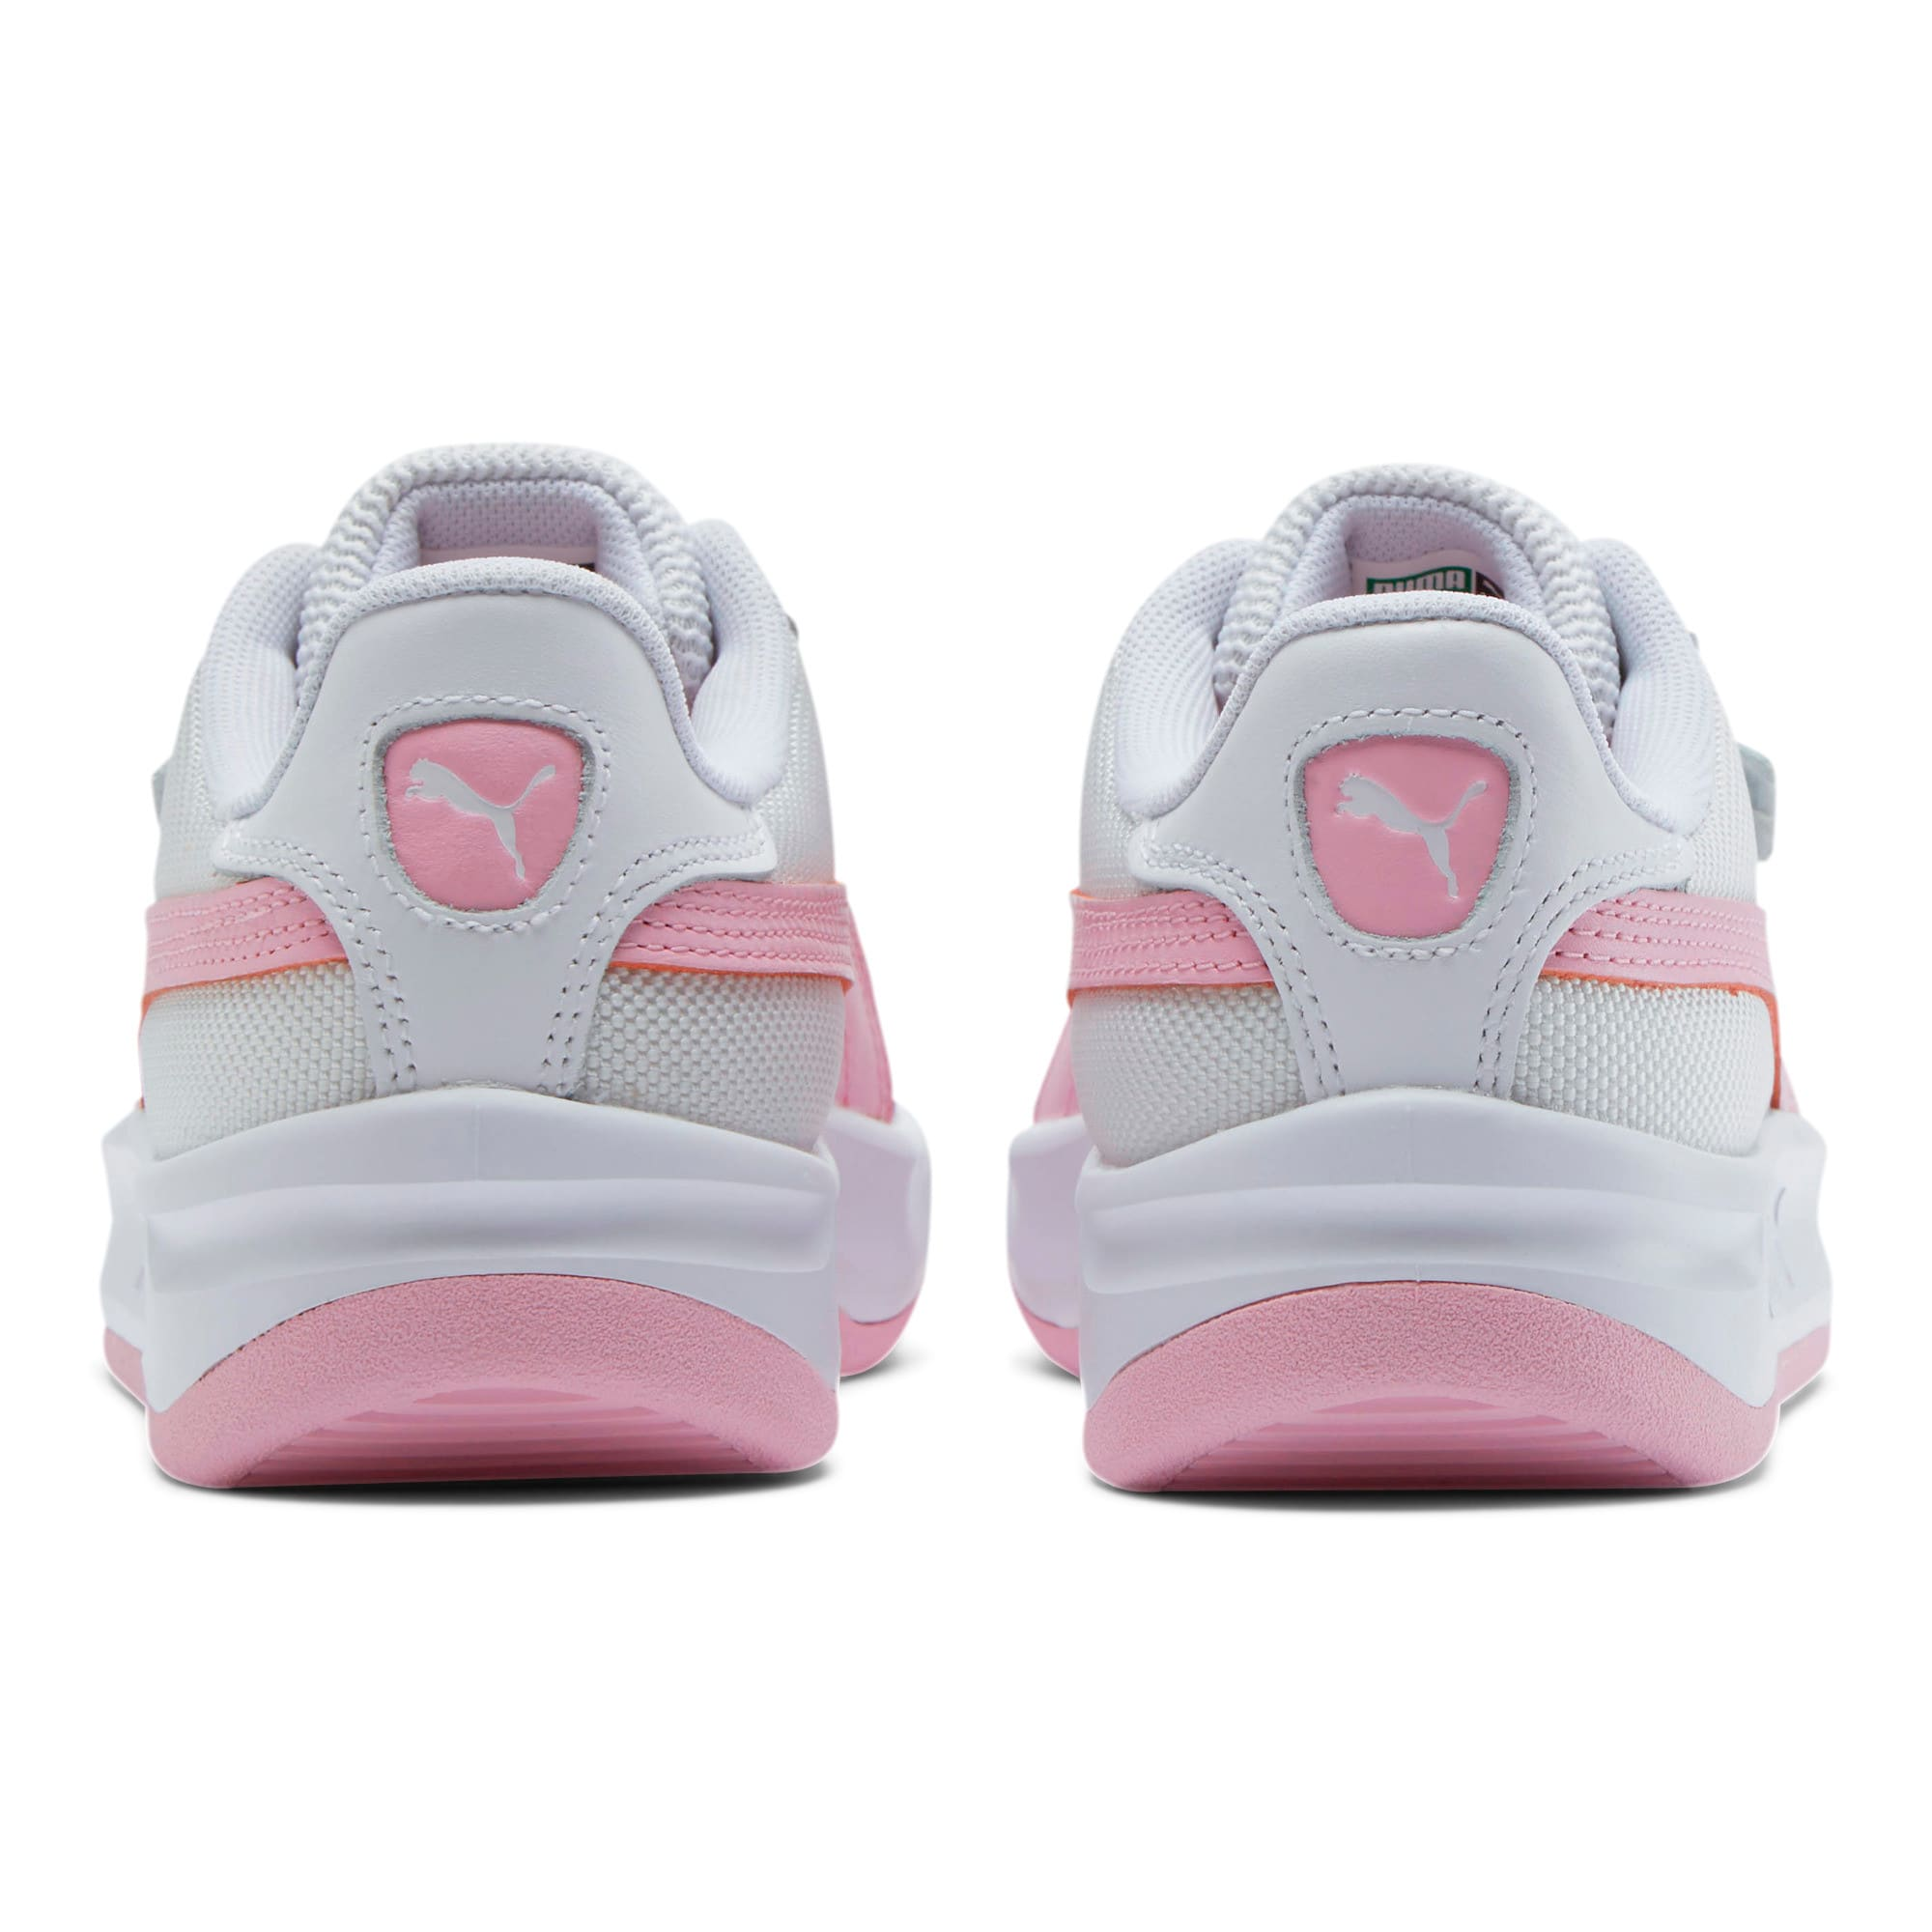 Thumbnail 3 of California Women's Sneakers, Puma Wht-Pale Pink-Puma Wht, medium